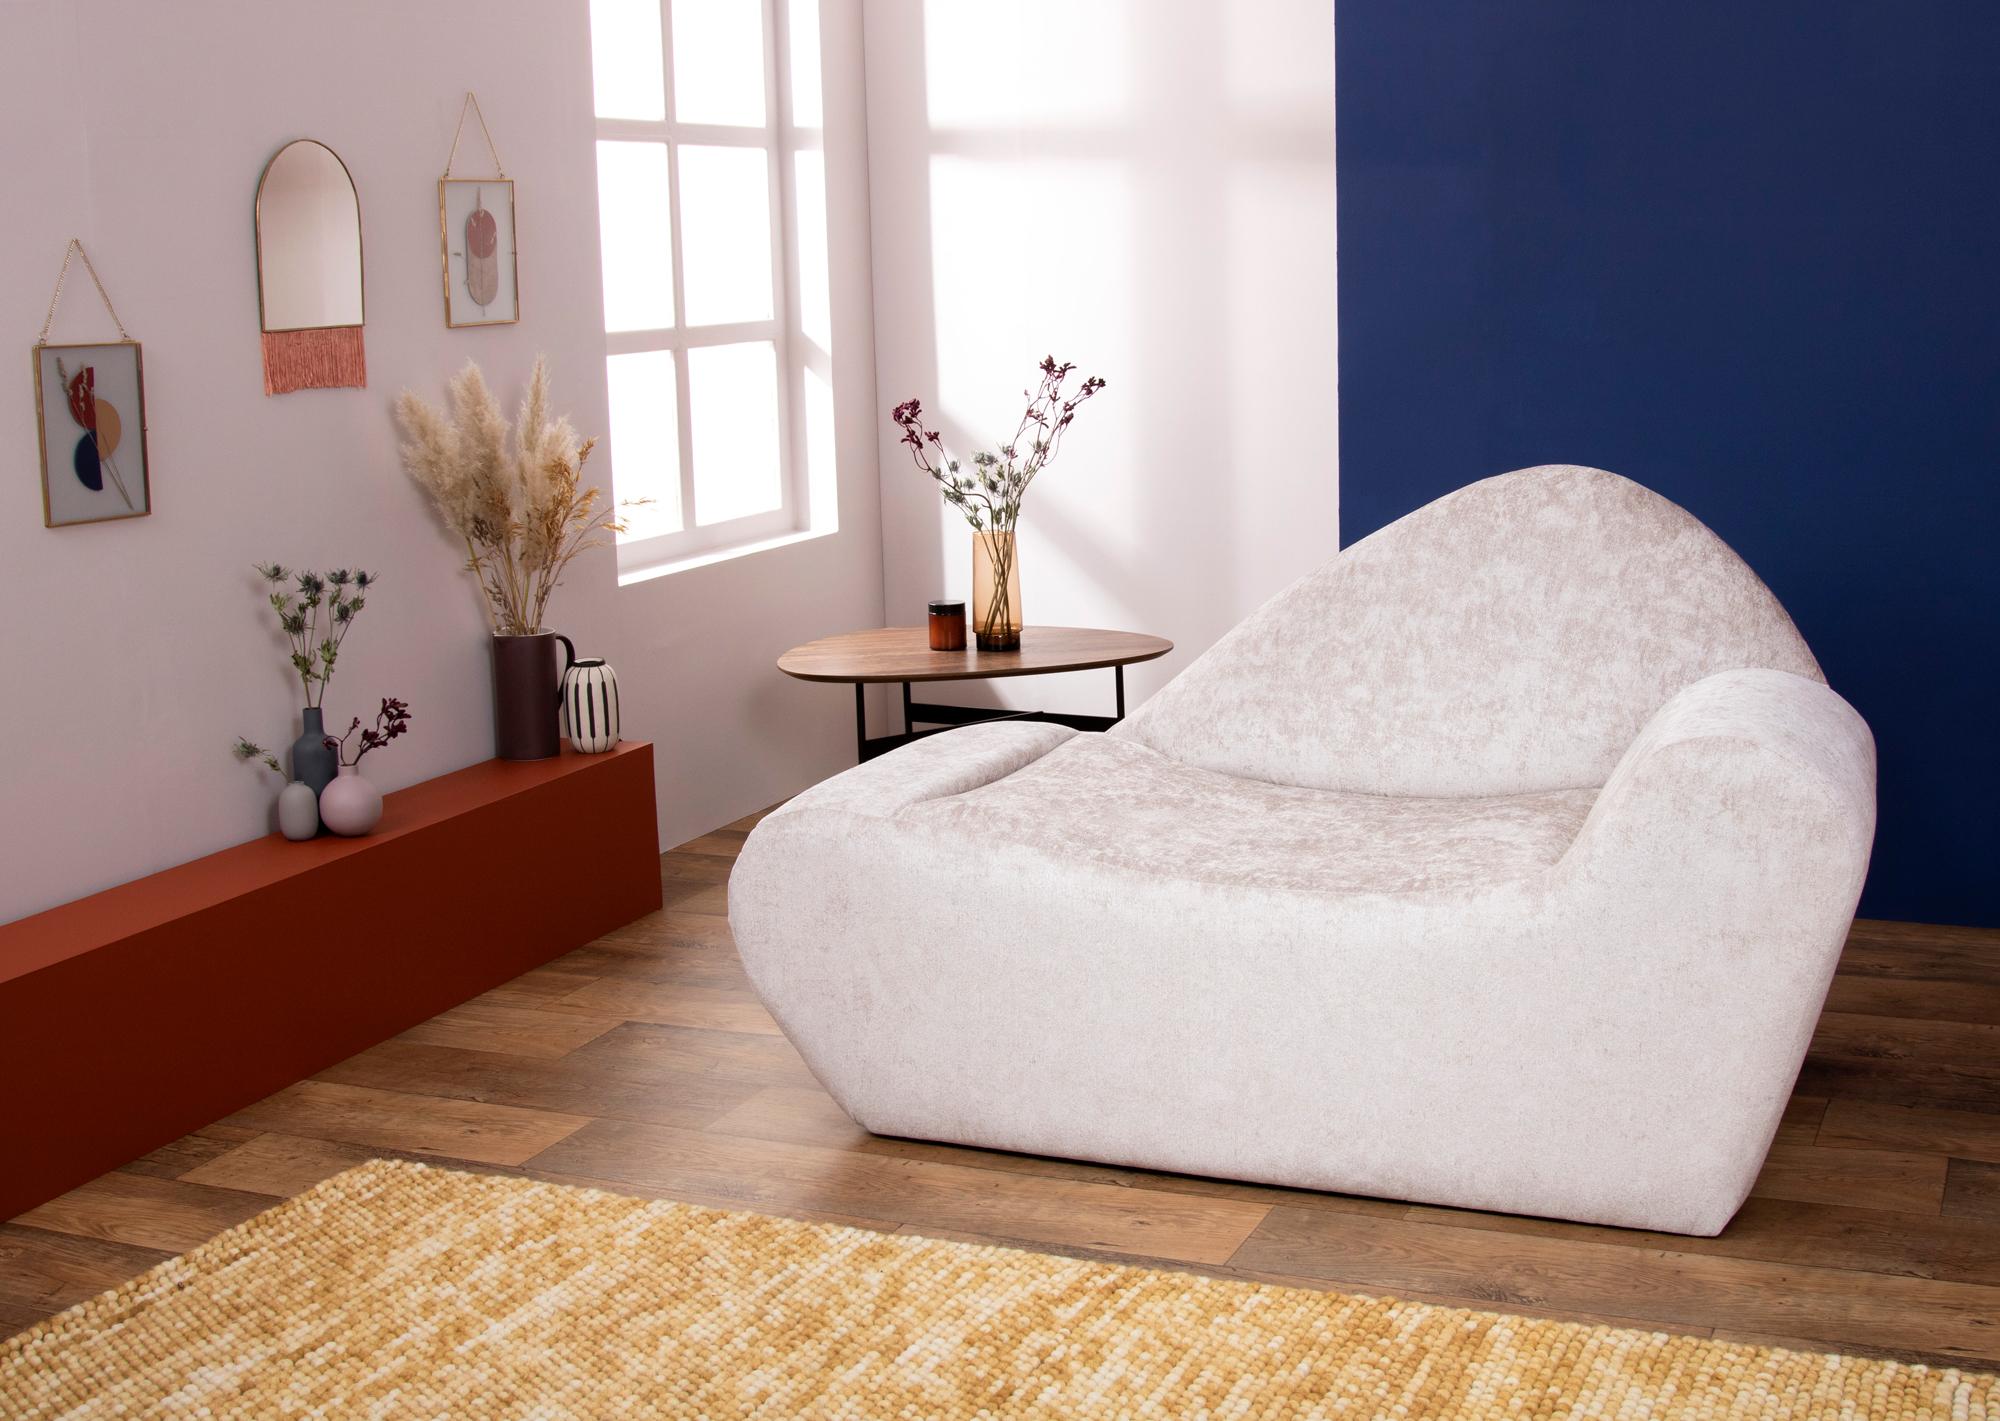 Ayla-Dune-Chair-Chenille-LF-1-web.jpg